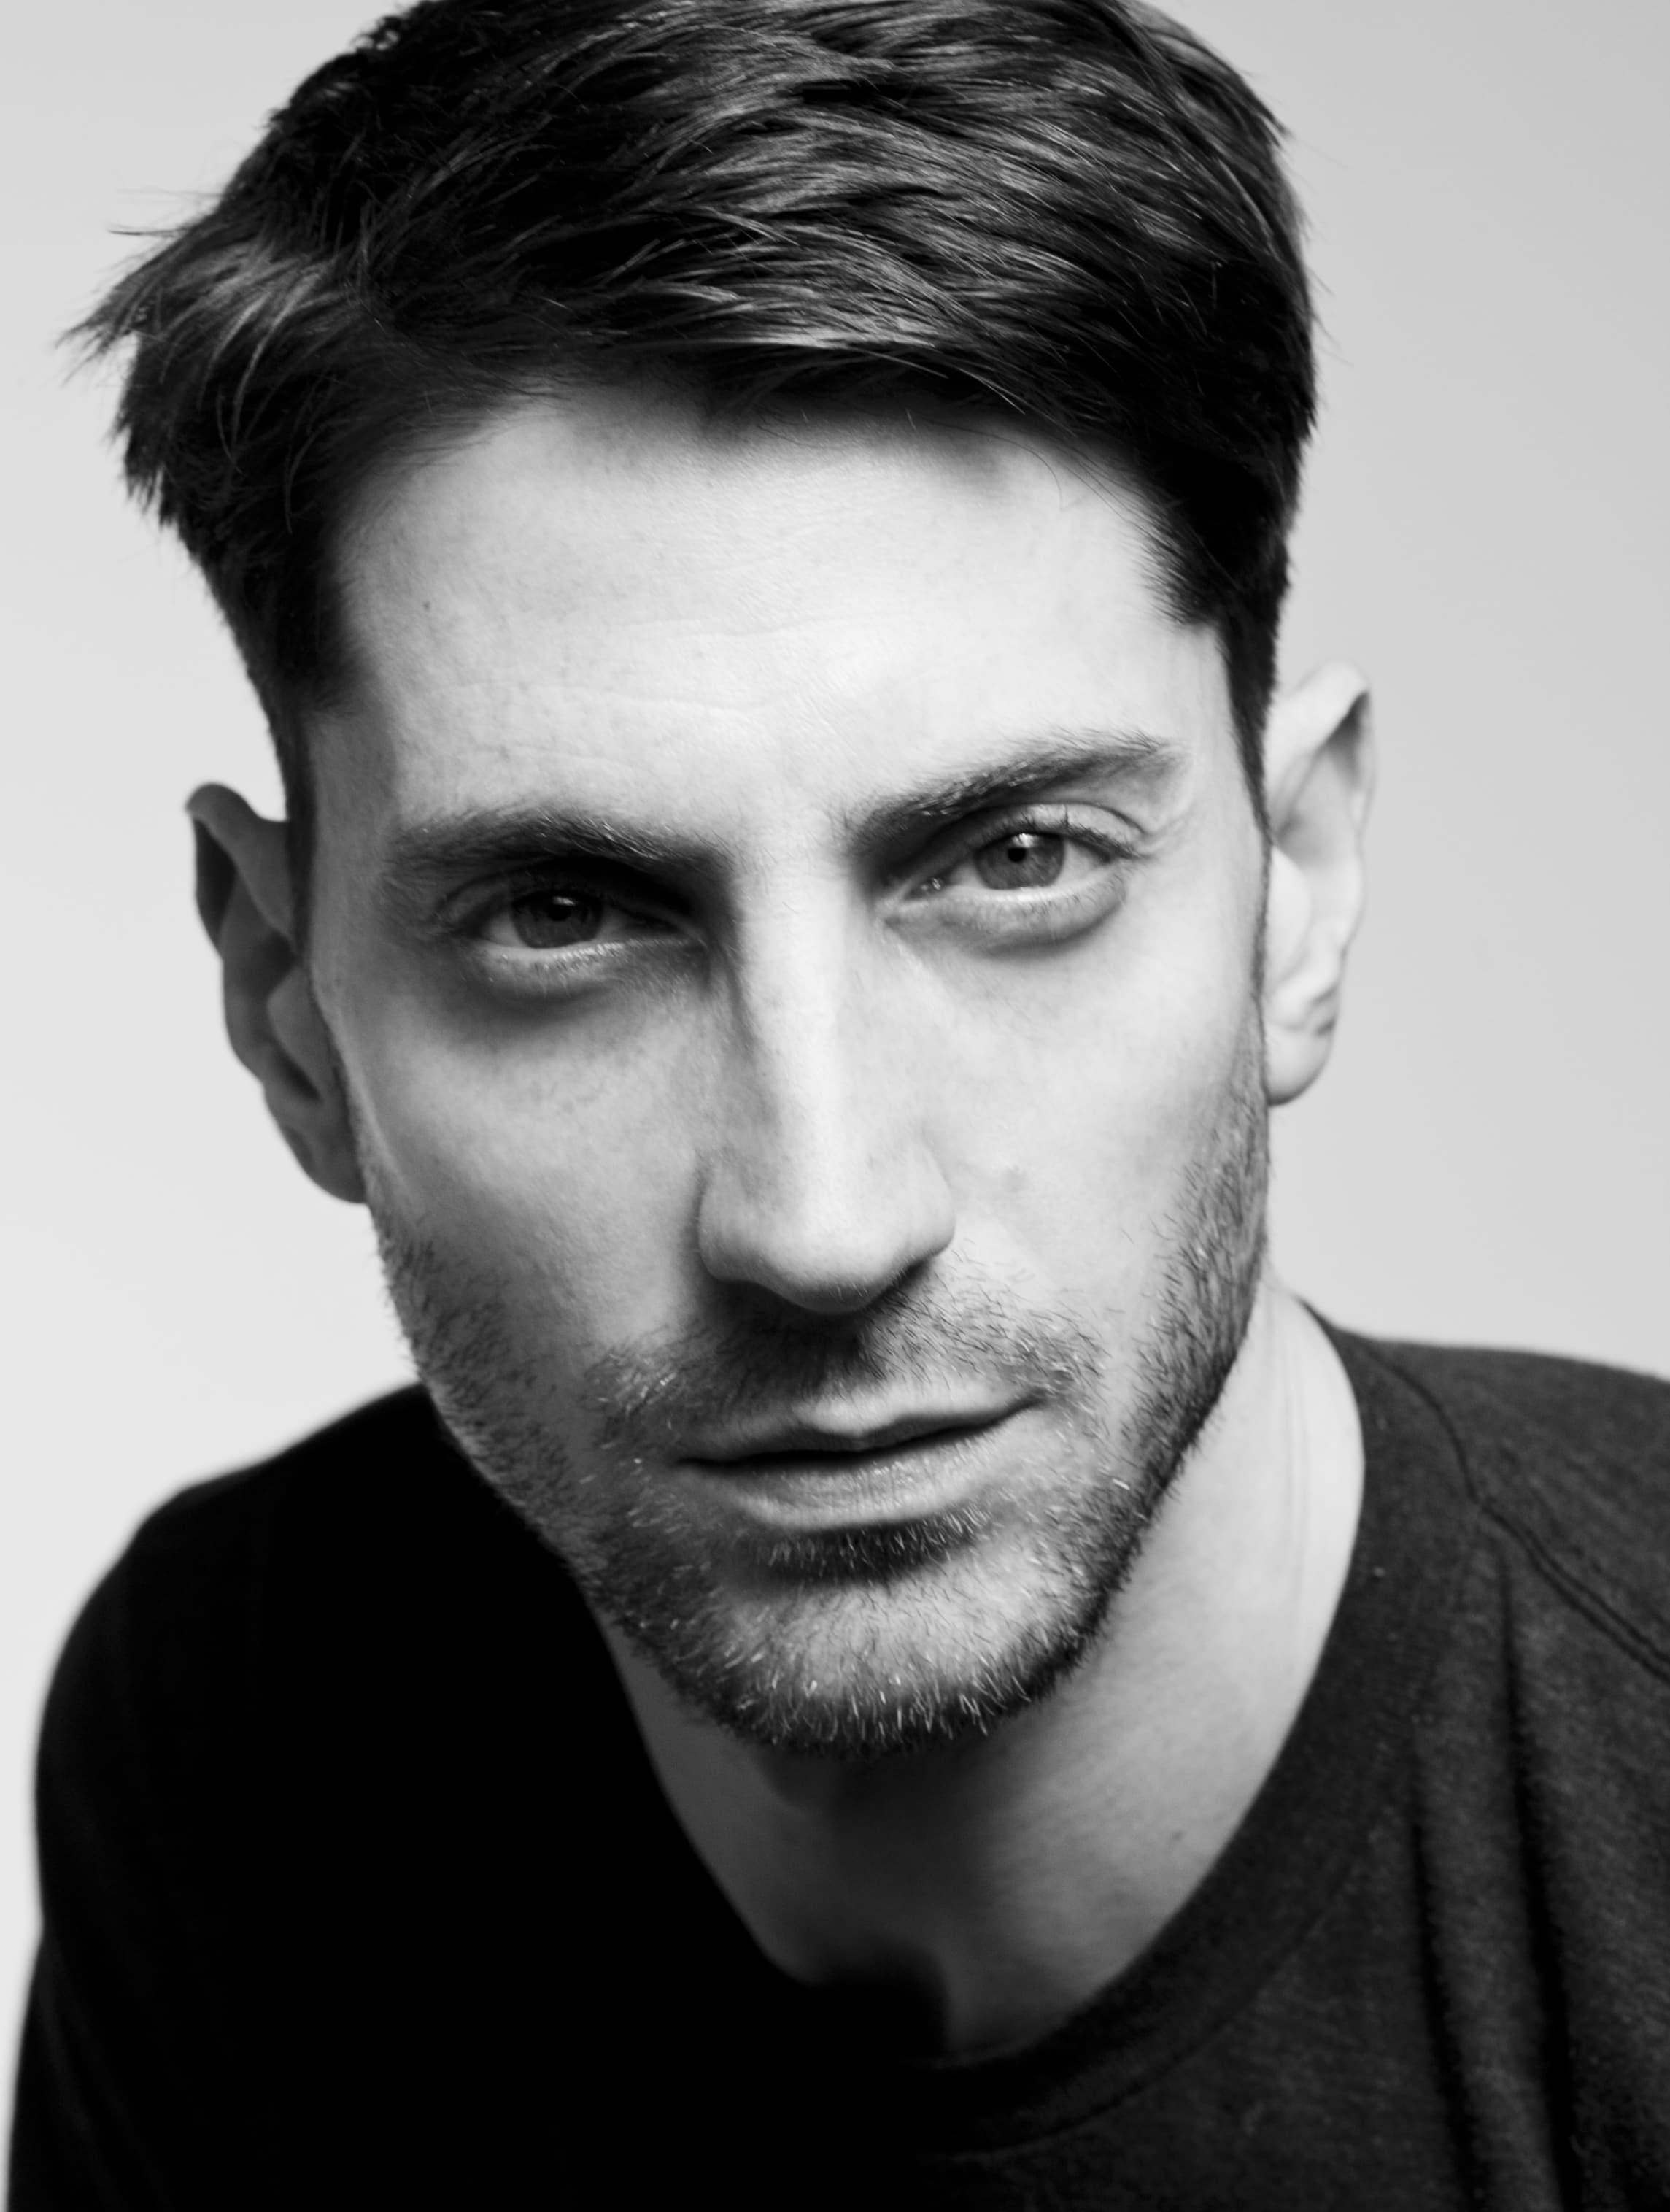 Iddo Goldberg Israeli, British Actor